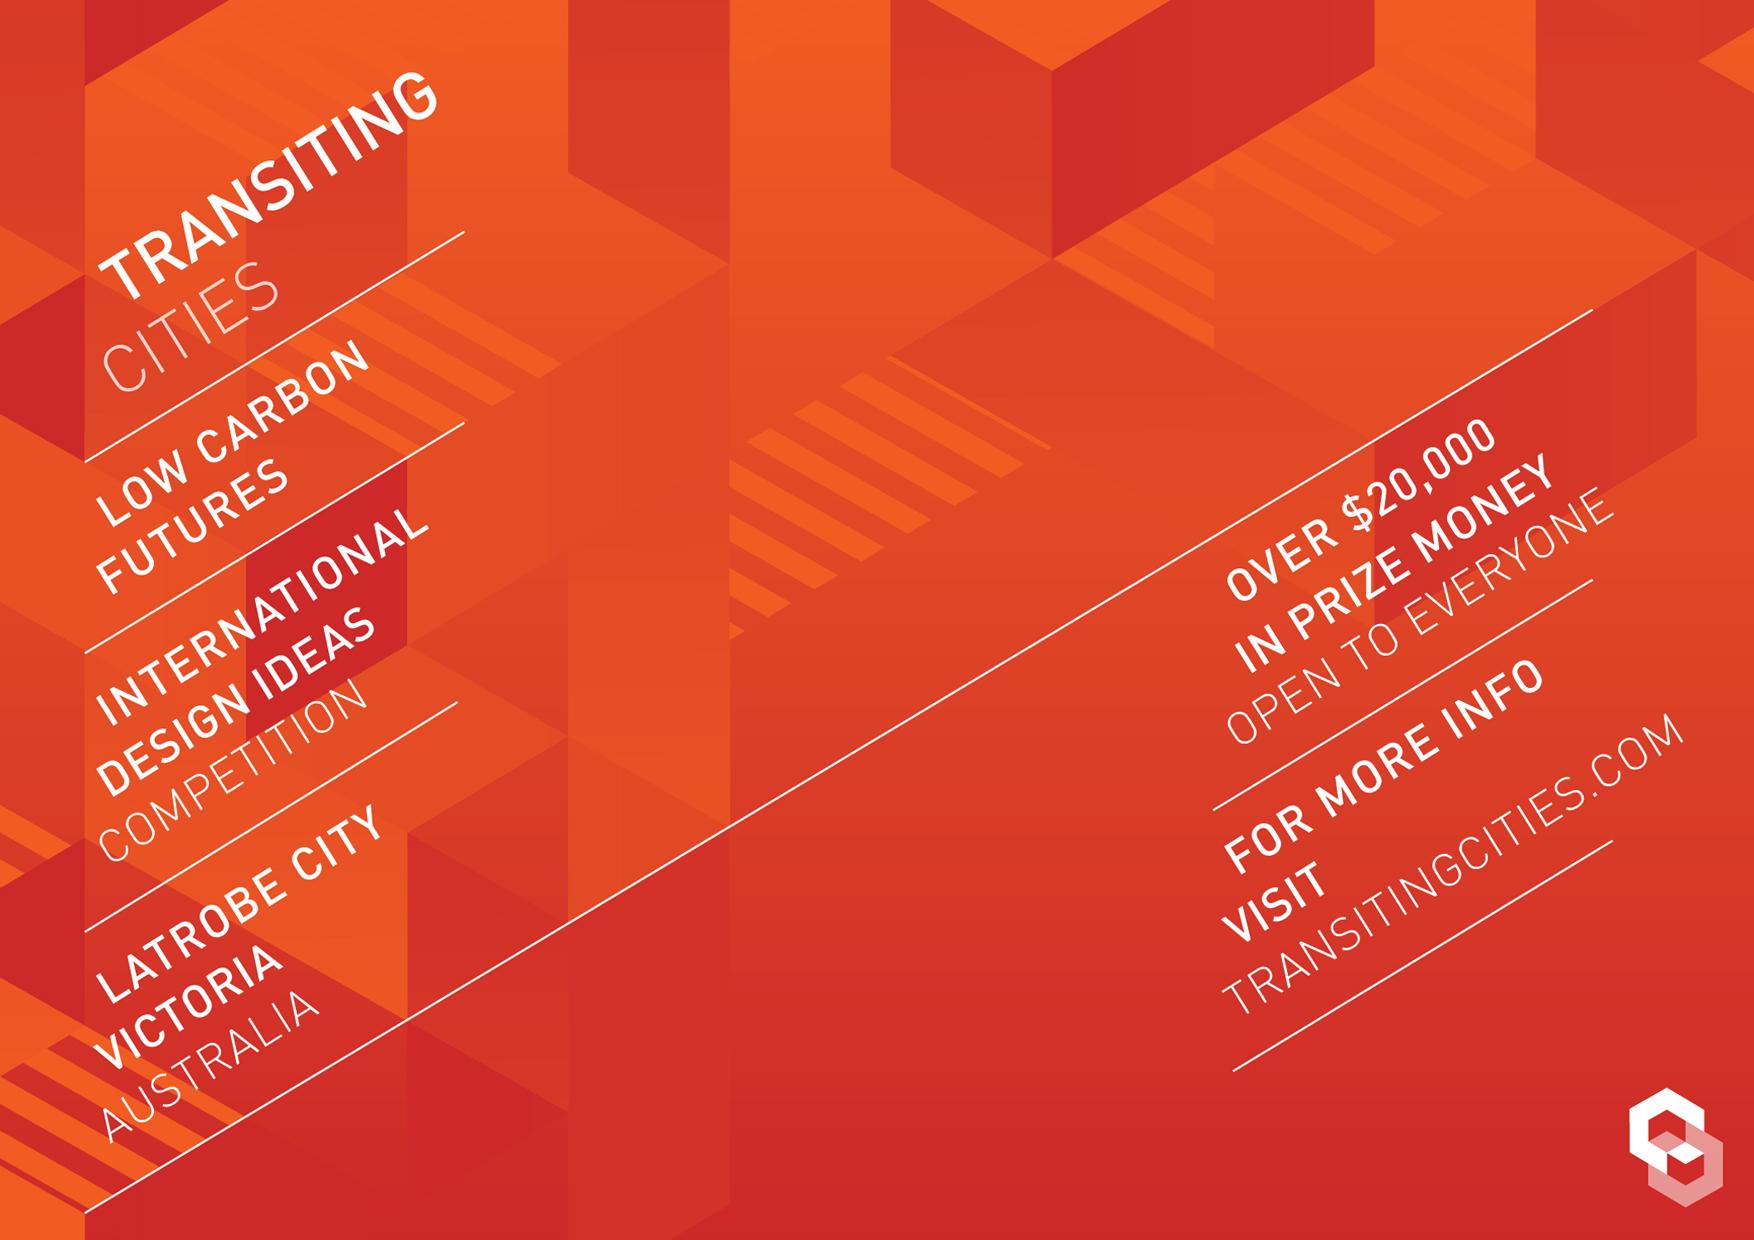 Concurso Internacional de Ideias: Transiting Cities Open Design , Cortesia de OUTR e RMIT University School of Architecture and Design